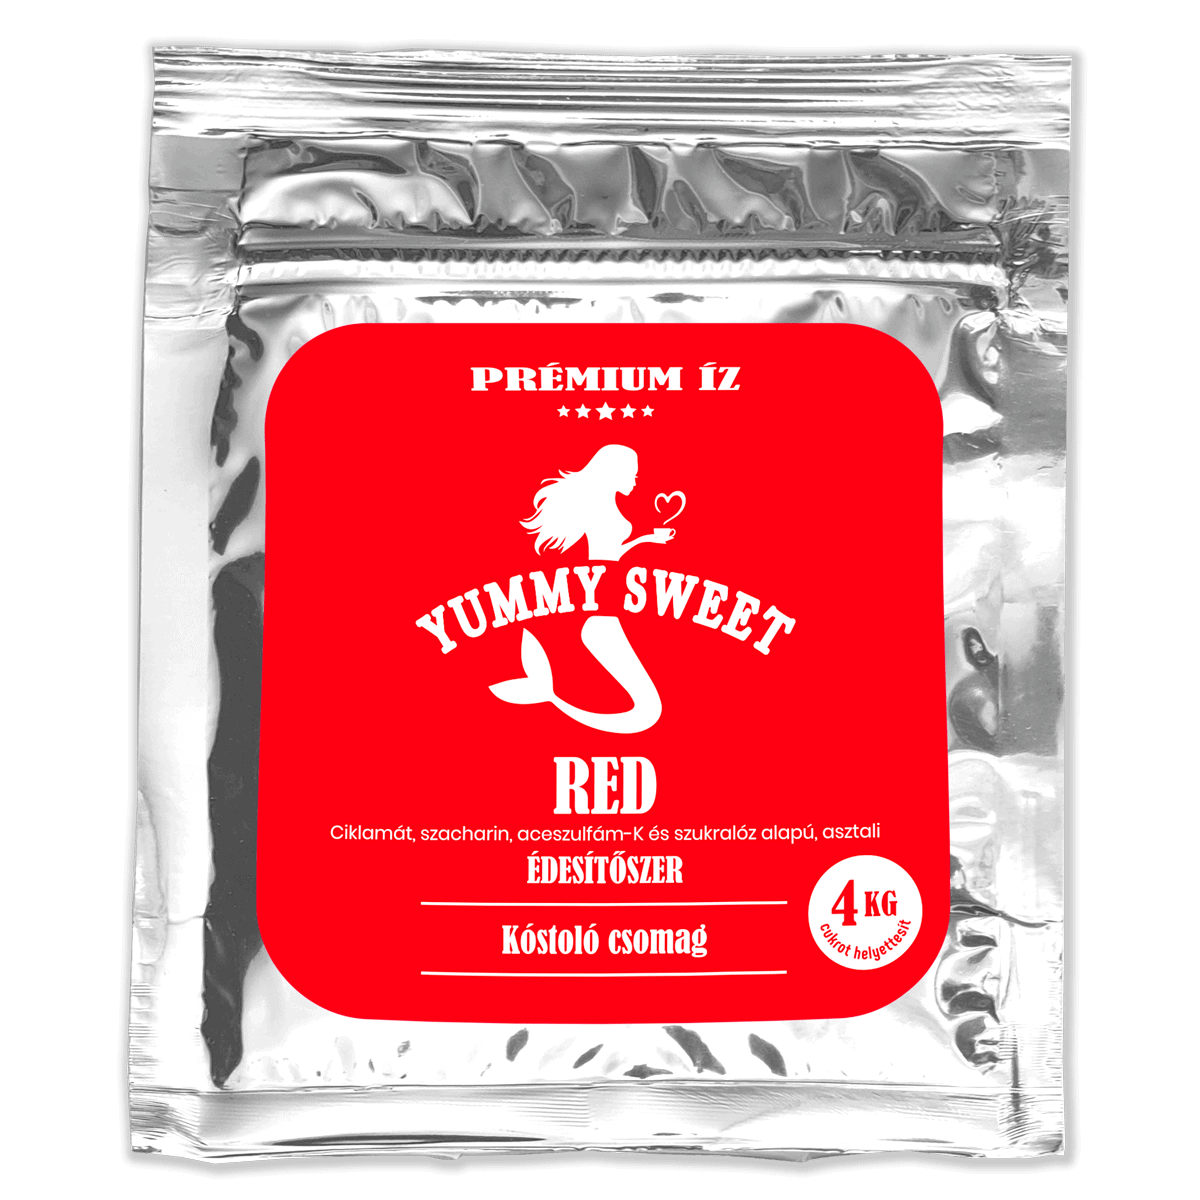 Yummy Sweet Edesitoszerek Red Kostolocsomag 24g 2020 4